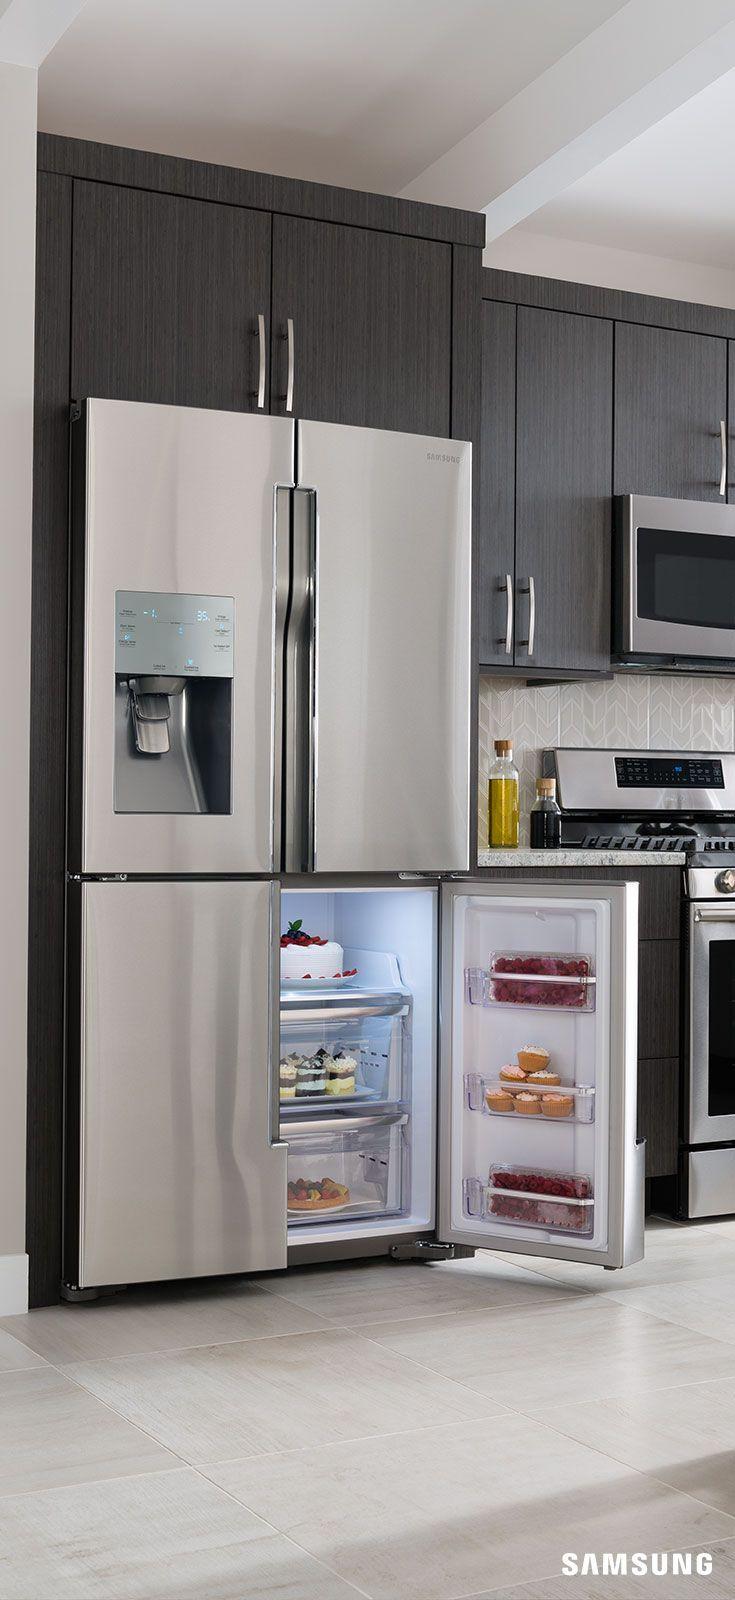 Samsung RF23J9011SR 23u0027 Counter Depth 4 Door Flex Refrigerator. Has A  Convertible Bottom Right Compartment That Can Be A Fridge Or Freezer.